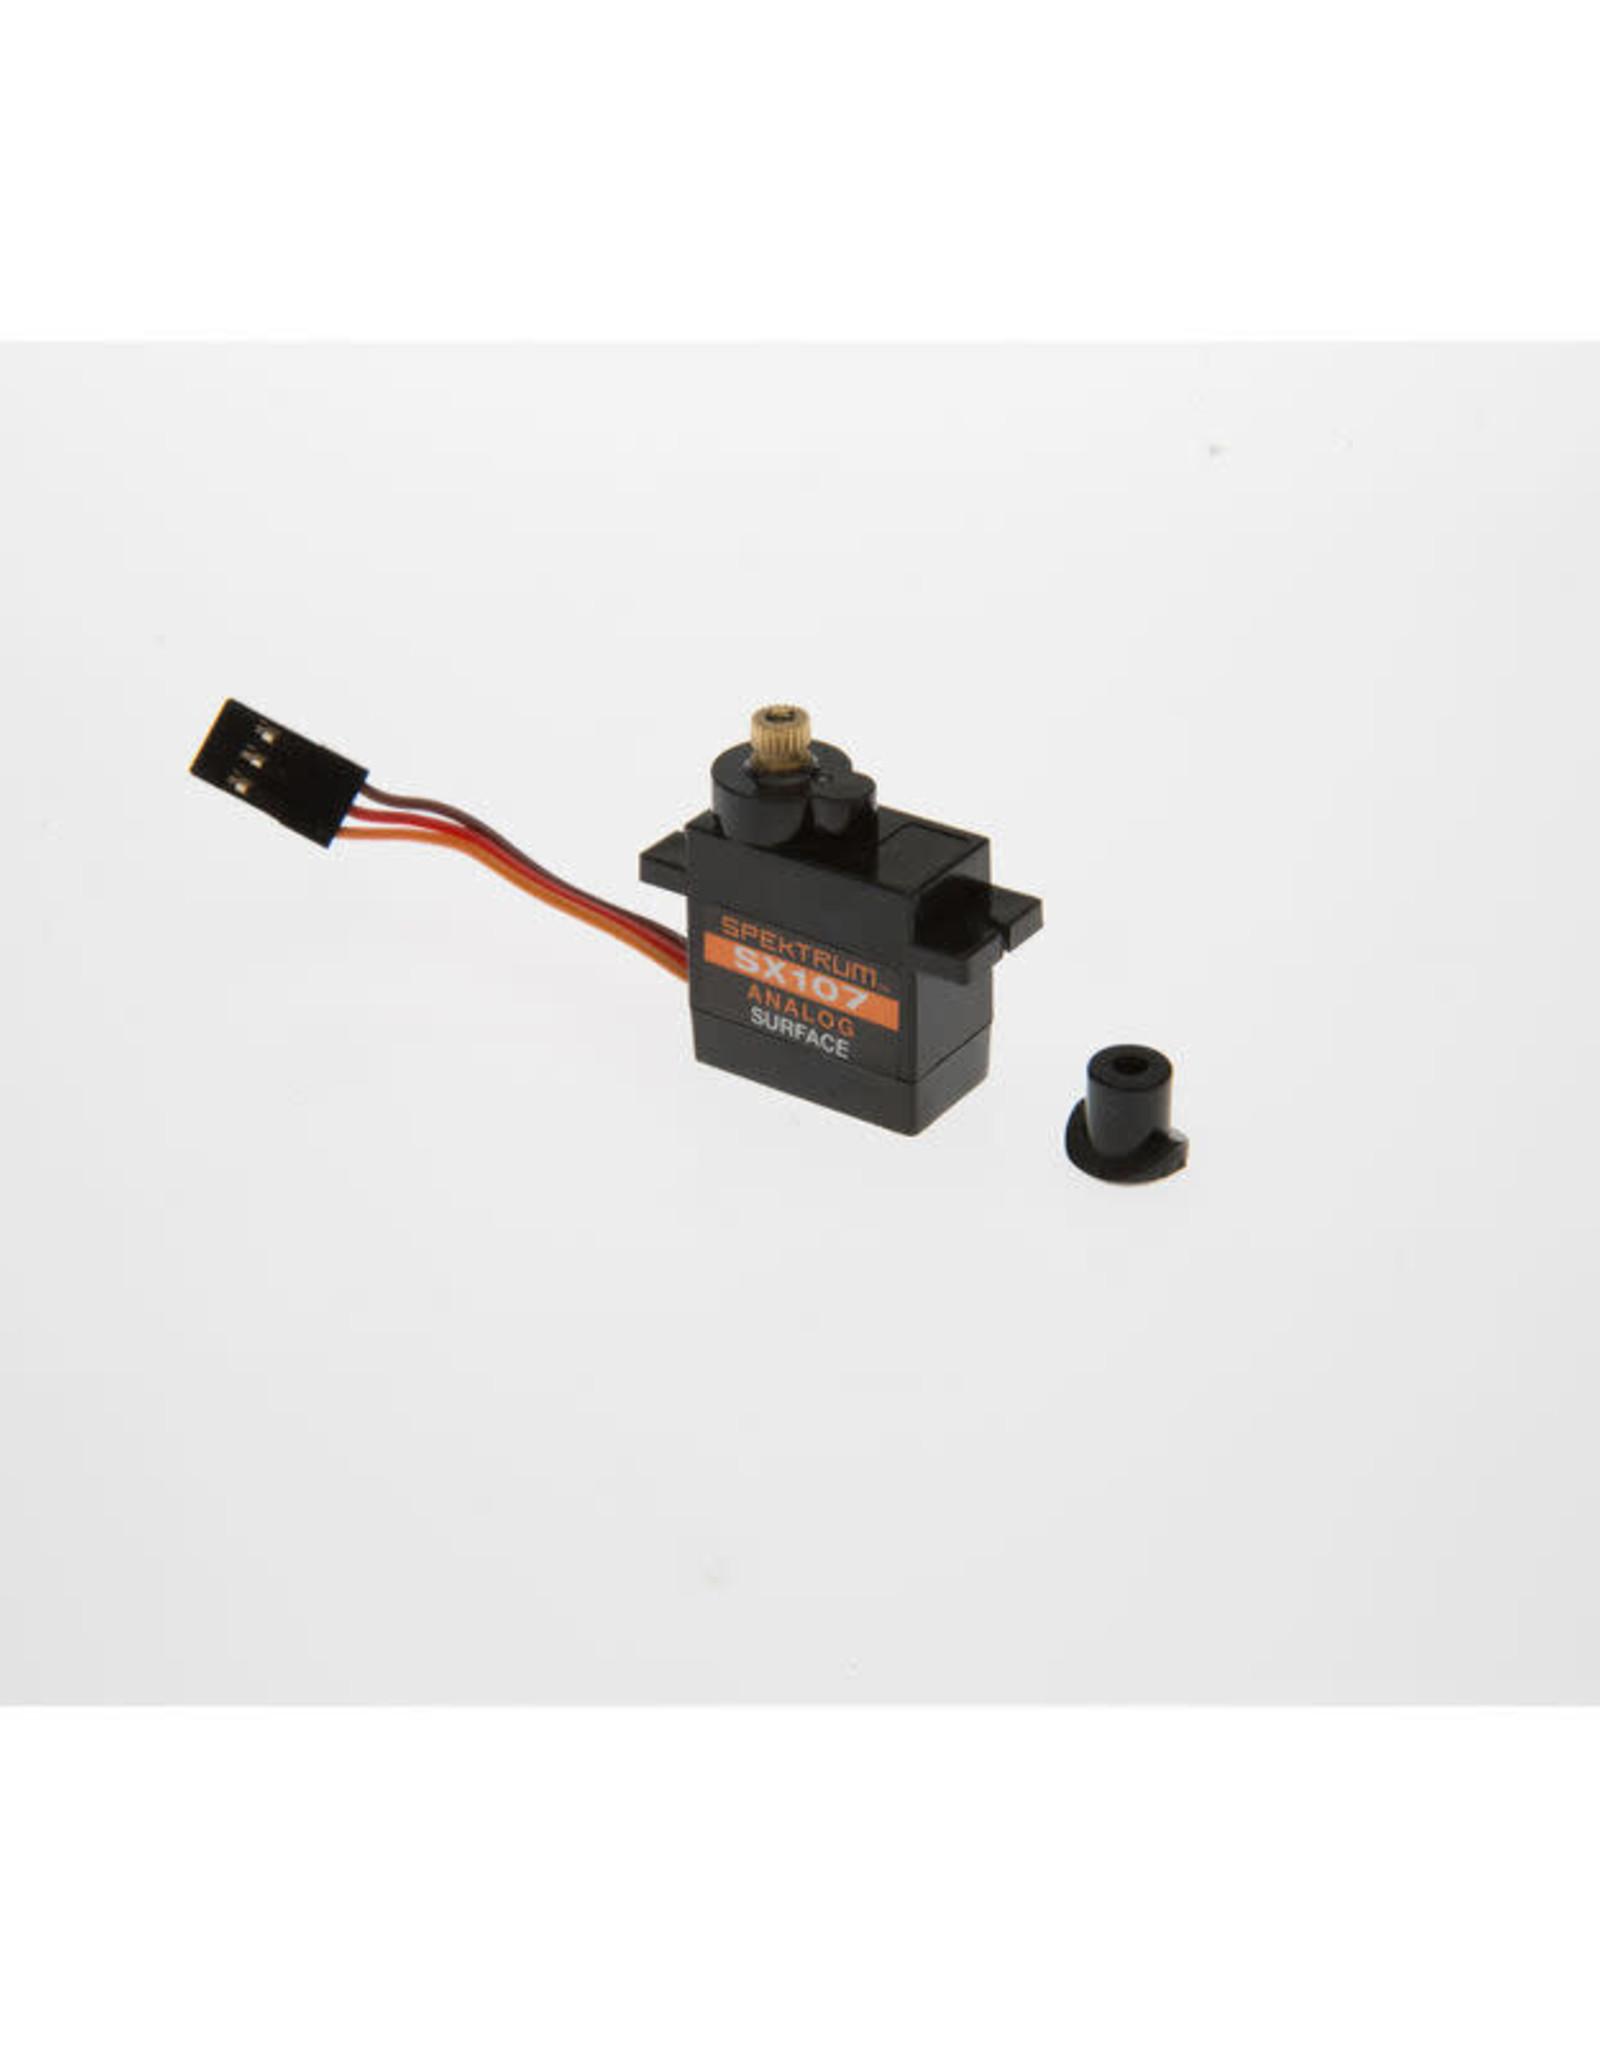 spektrum SPMSSX107 SX107 Micro Analog Metal Gear Surface Servo